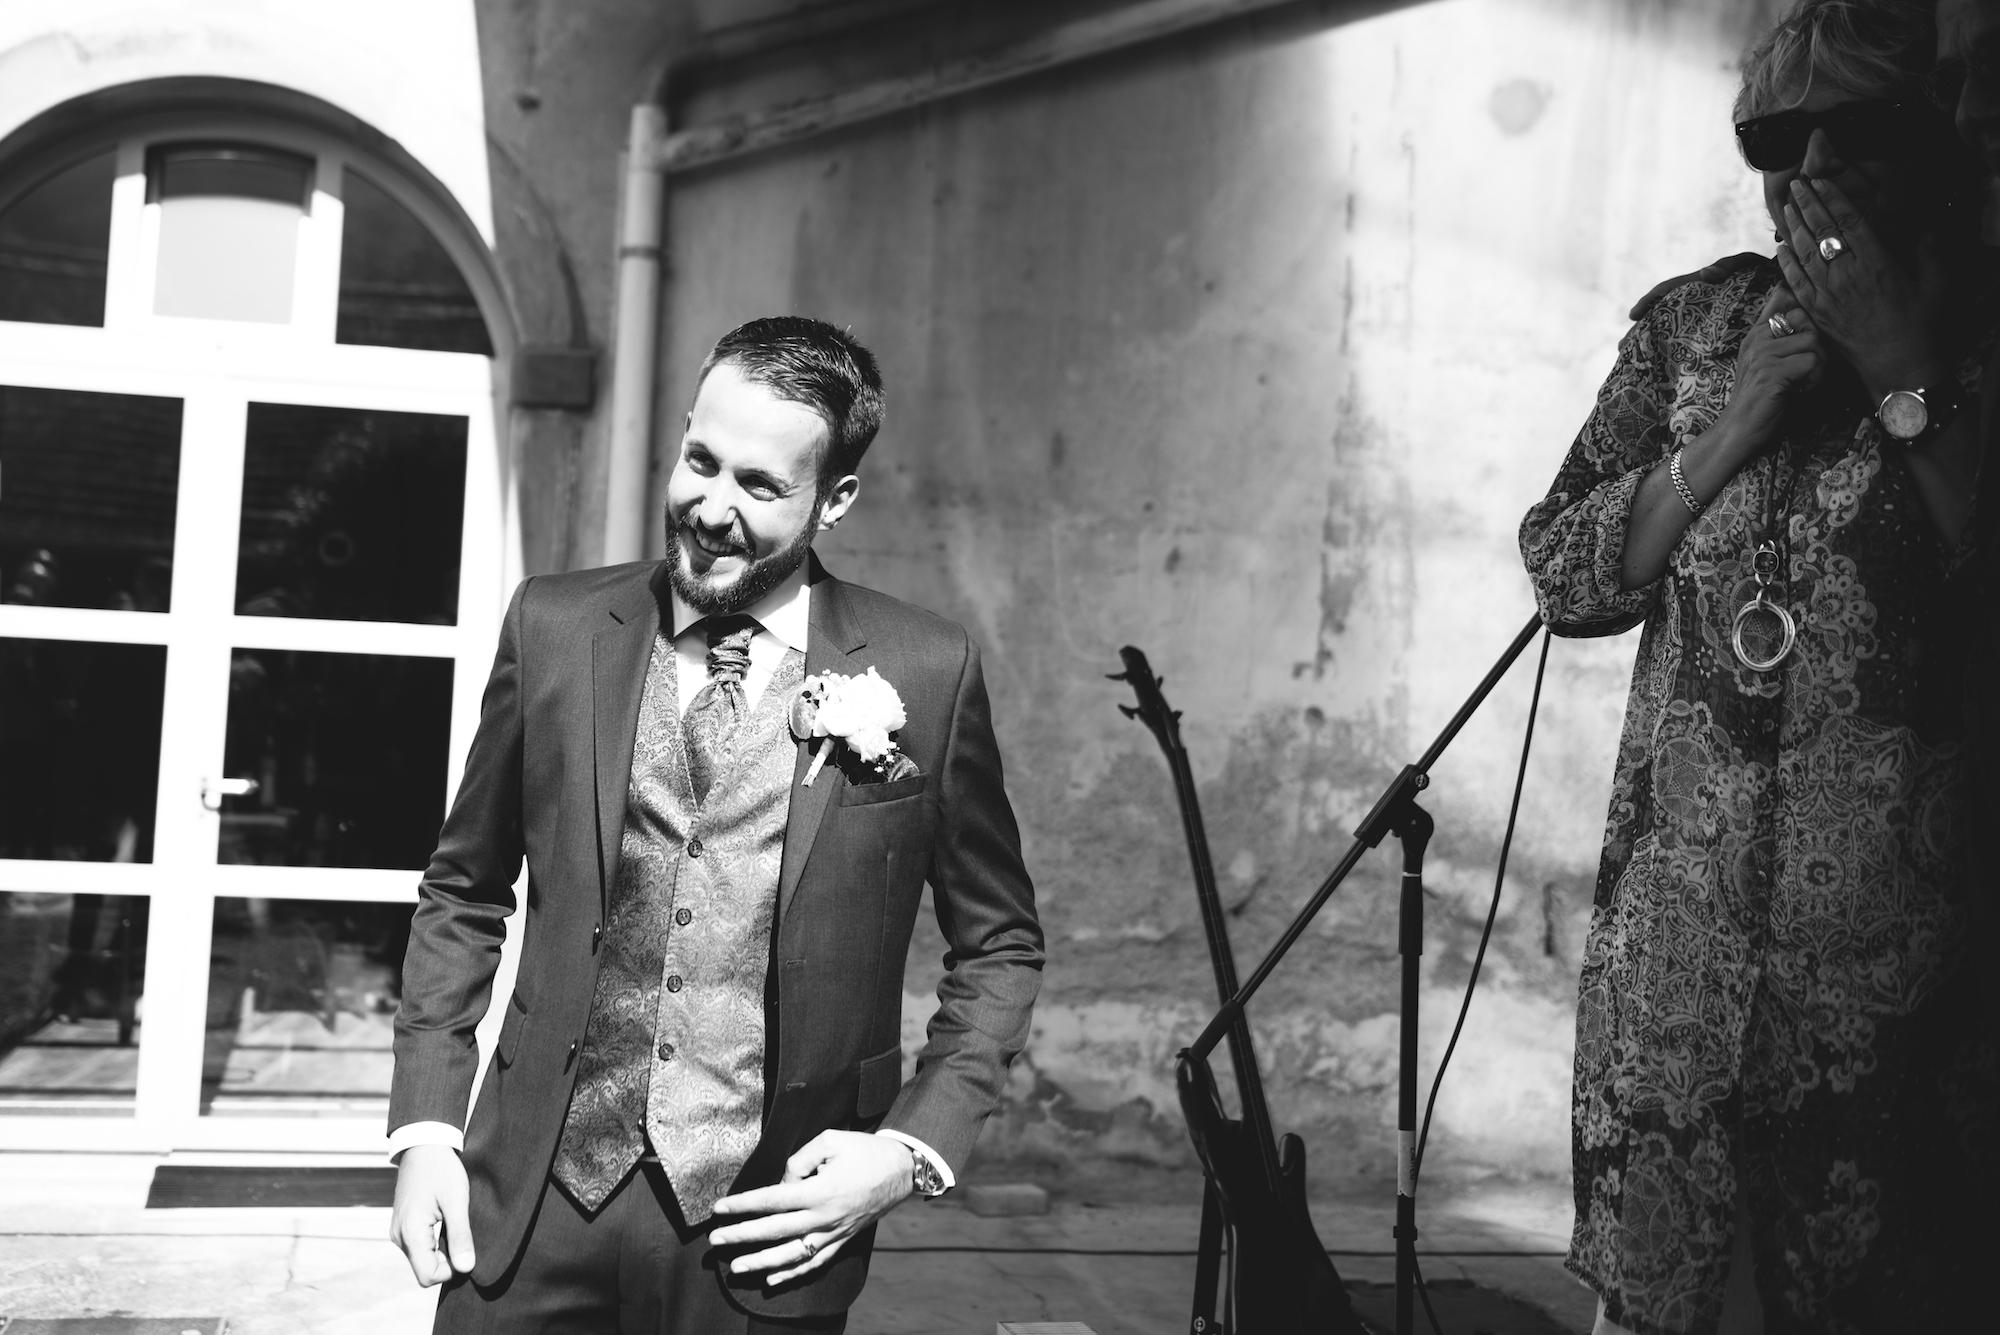 NadiaundMichael_Hochzeit_BekaBitterliFotografie_190.jpg